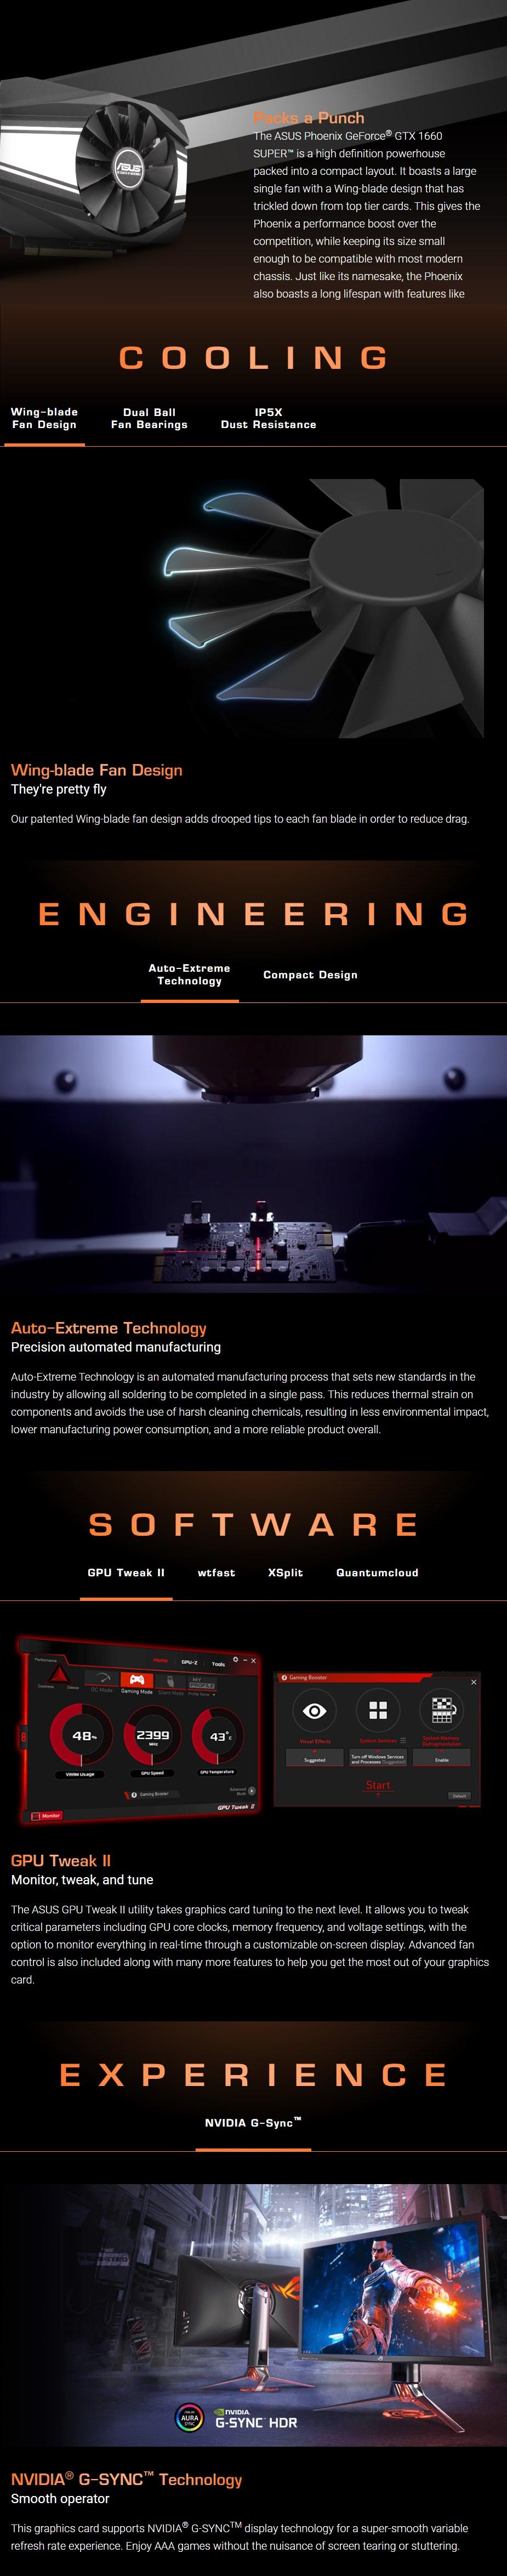 asus-geforce-gtx-1660-super-pheonix-oc-6gb-video-card-ac28548-8.jpg